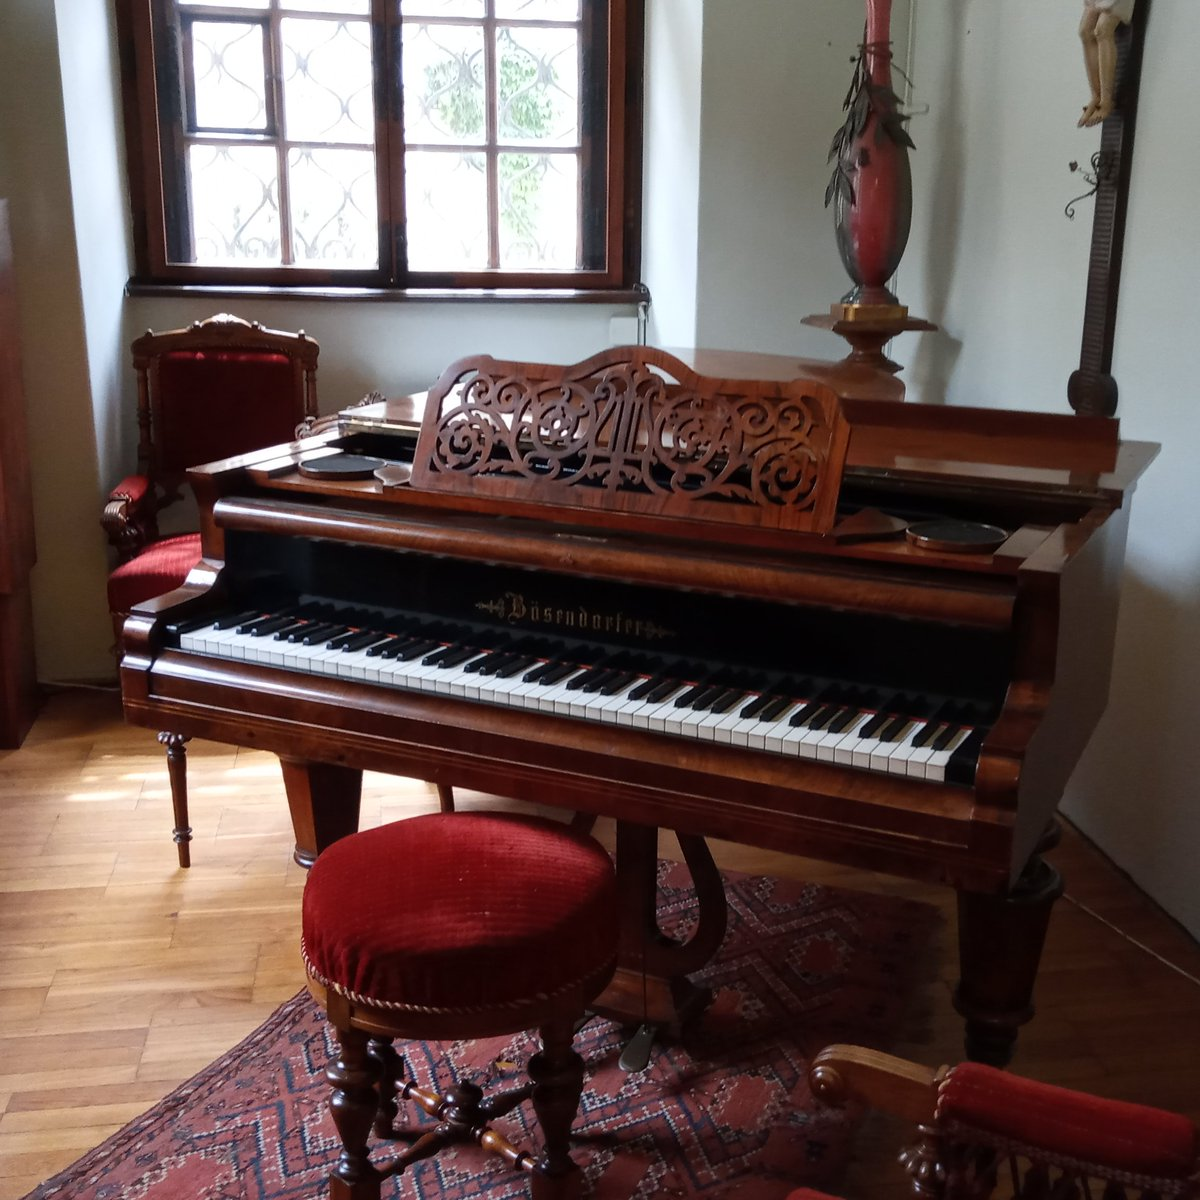 Antonín Dvořák's piano.  From the Antonín Dvořák Museum in #Prague, Czech Republic.  #music #history #art #Dvorak #classical